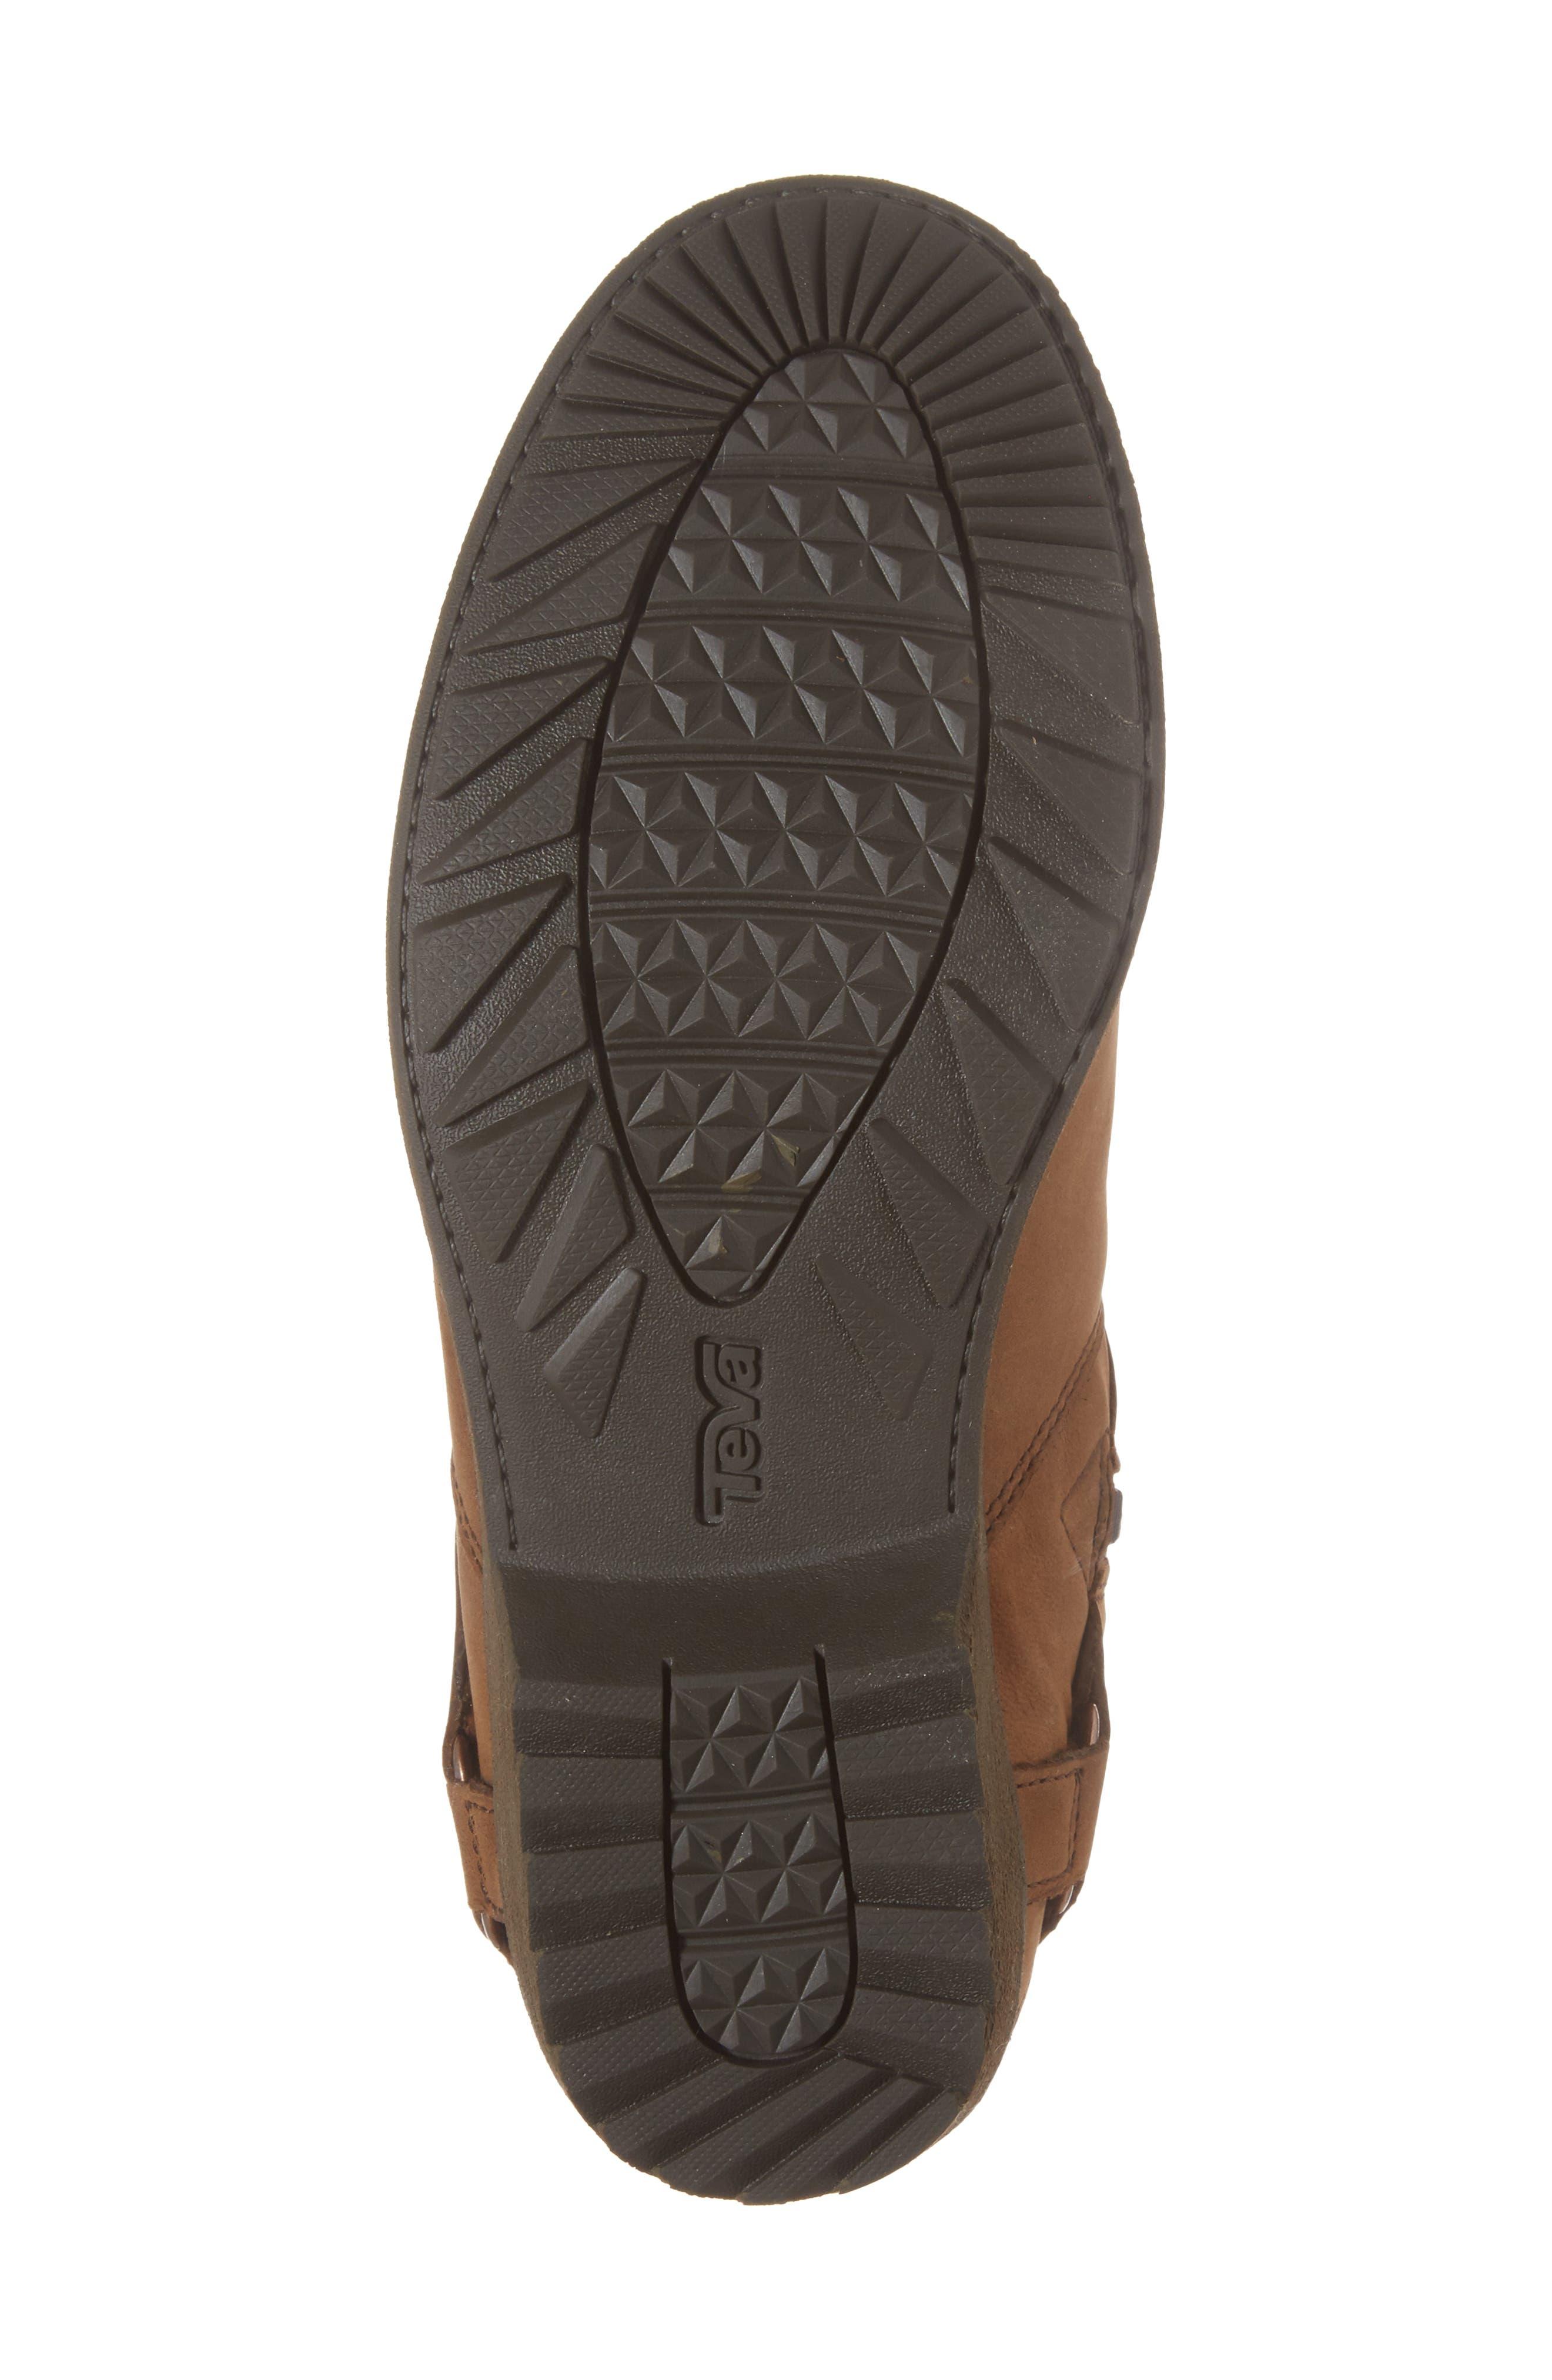 Dina La Vina Dos Waterproof Boot,                             Alternate thumbnail 6, color,                             Bison Leather